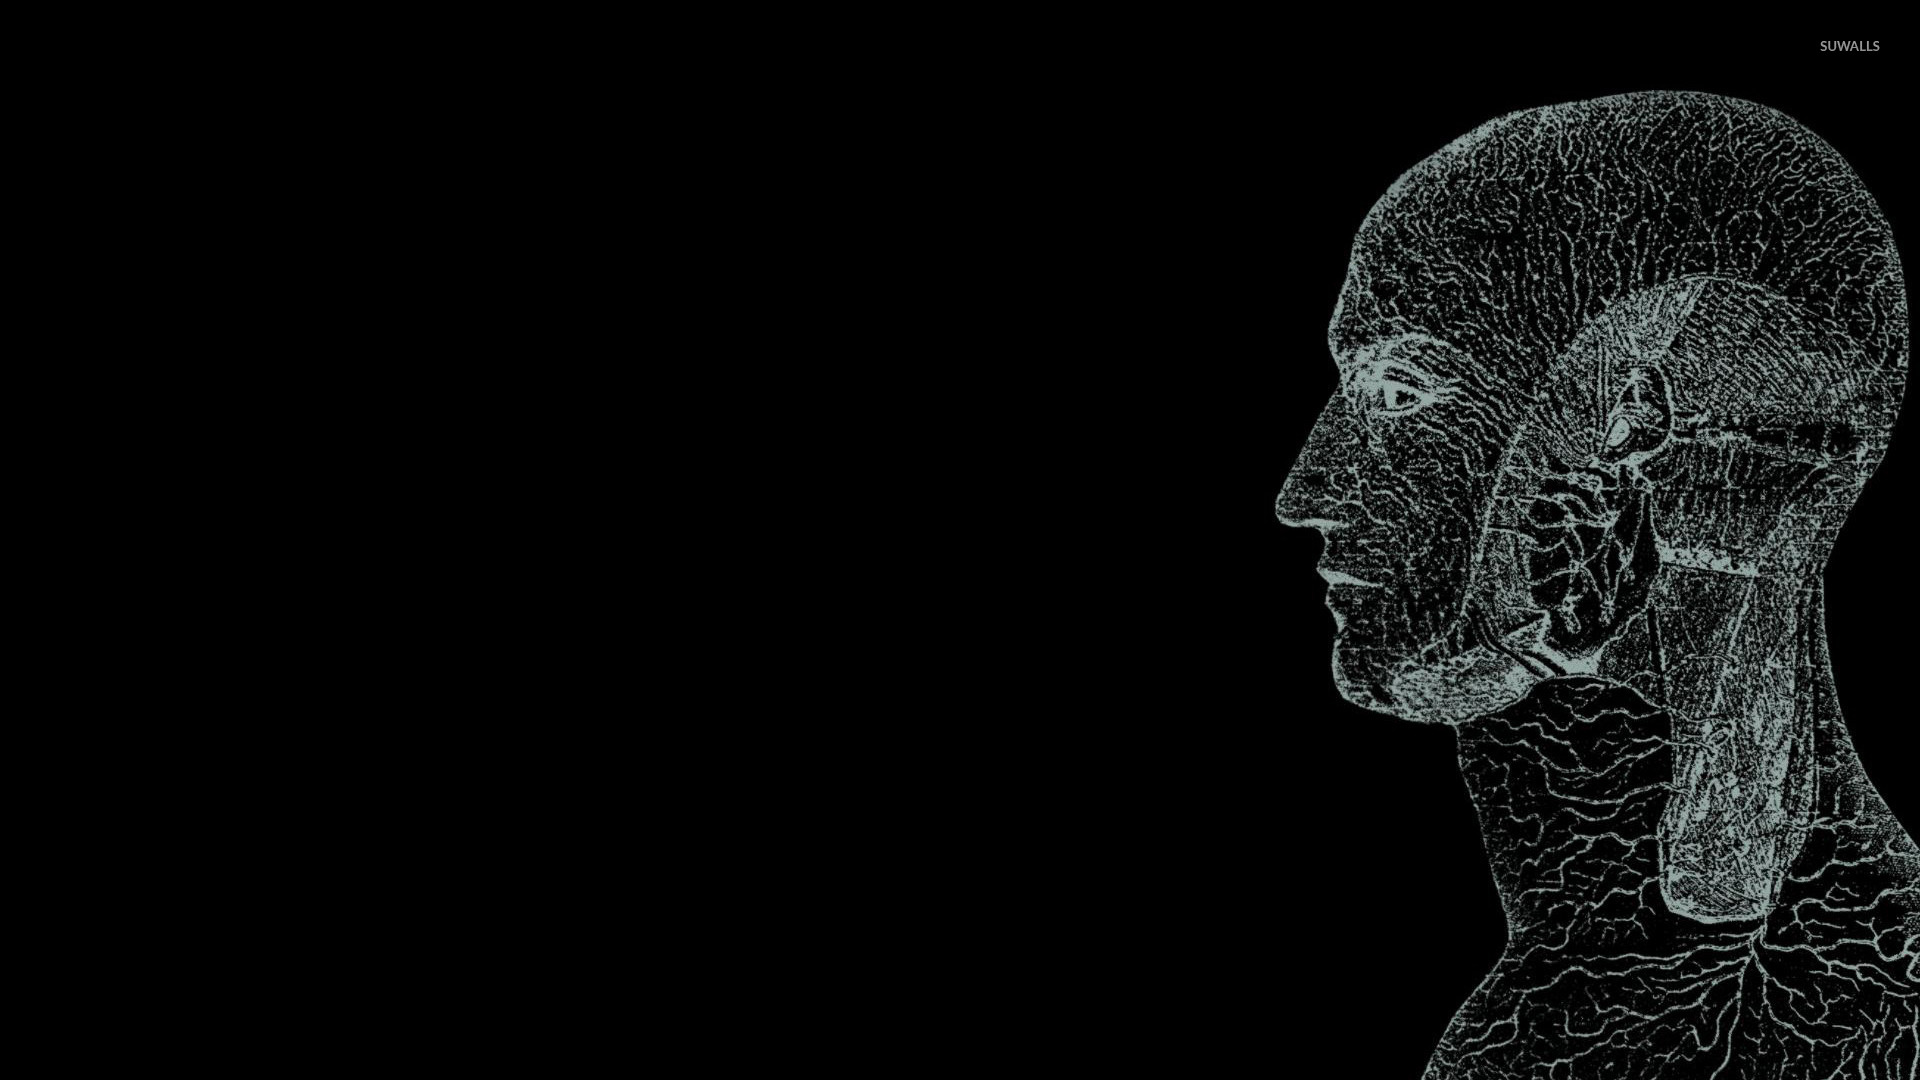 Deus Ex Human Revolution Quotes Wallpaper Human Silhouette Wallpaper Artistic Wallpapers 19105